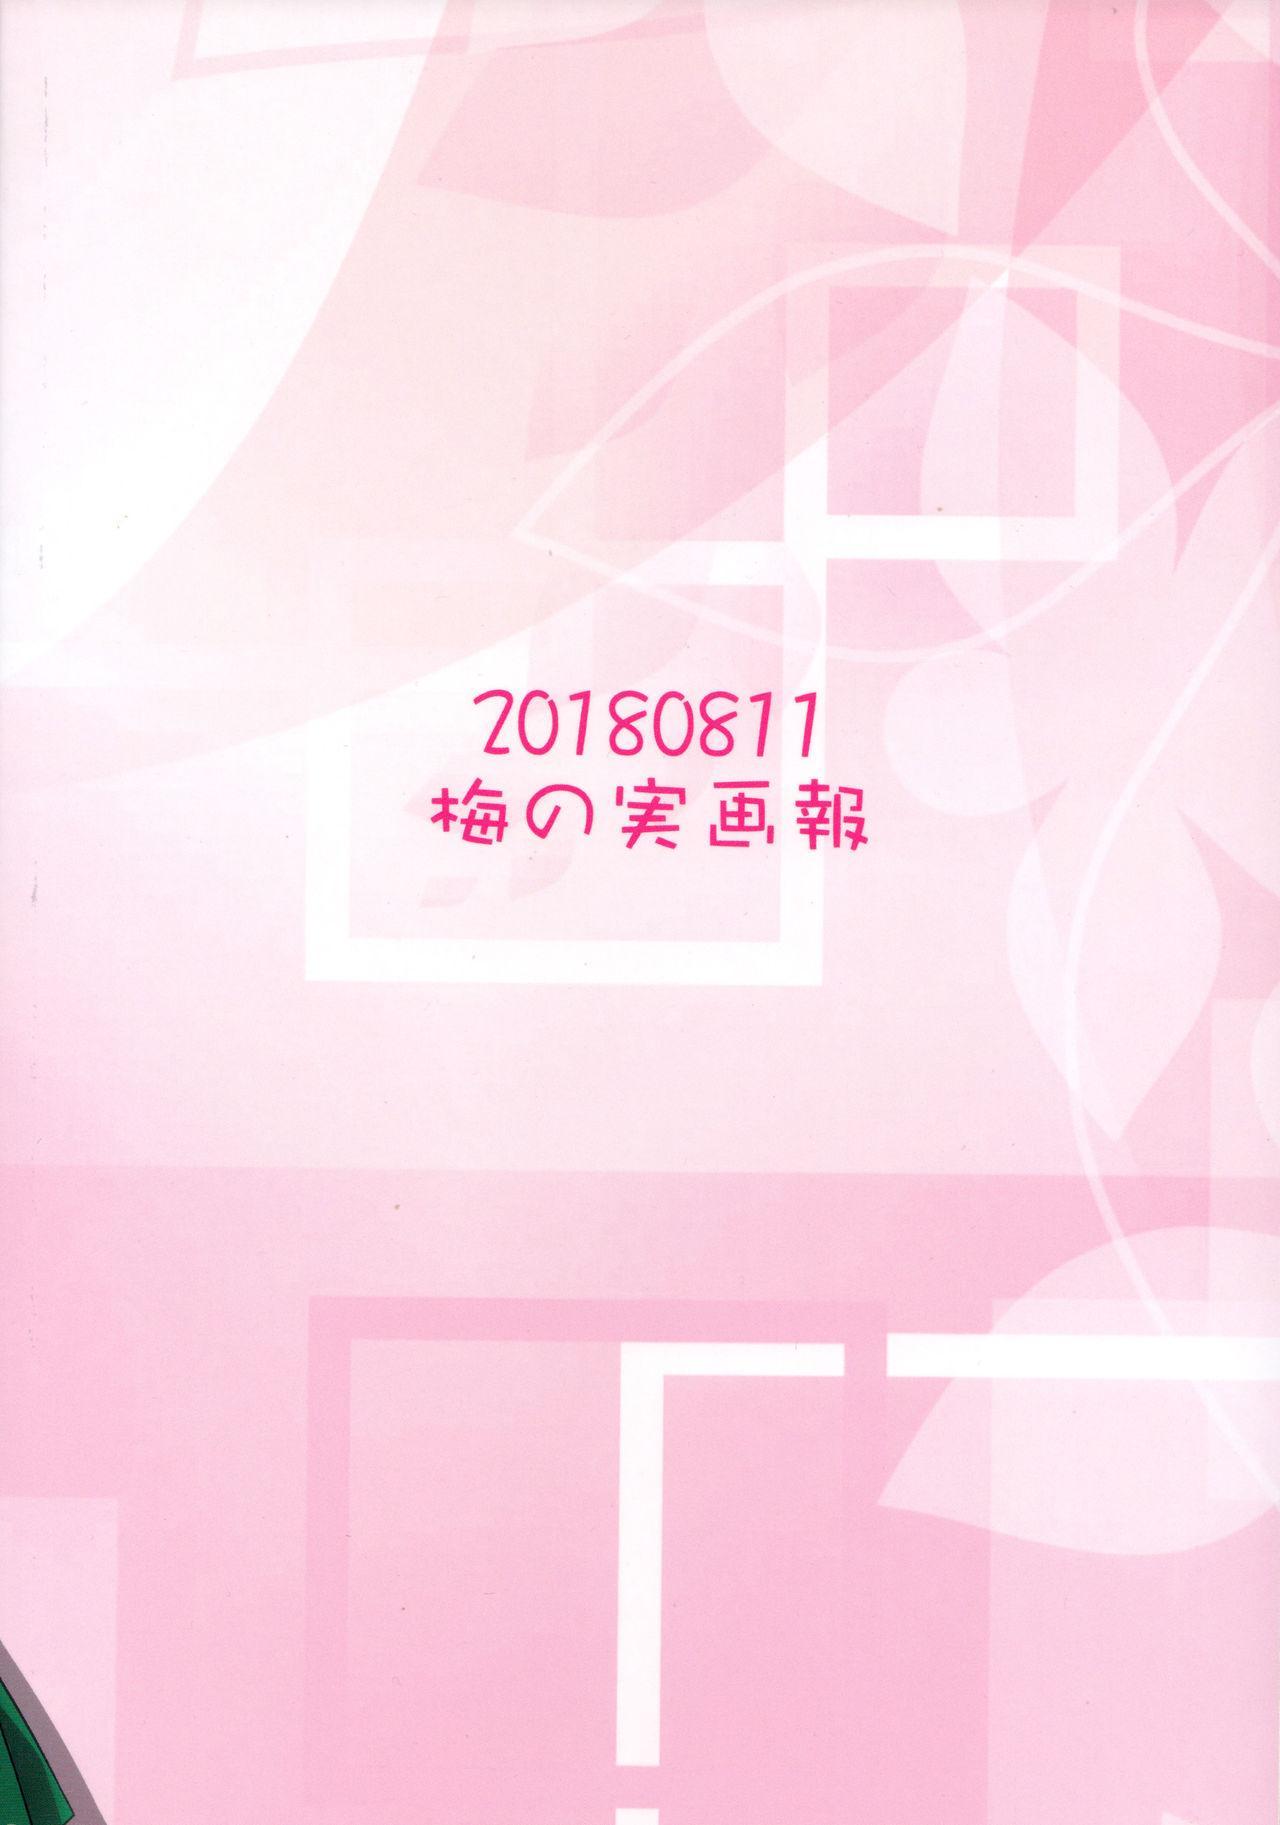 (C94) [Umenomi Gahou (Umekiti)] S na Kanojo ga Dekita Anzu-chan   Anzu-chan Got a Sadistic Girlfriend (Girls und Panzer) [English] {/u/ scanlations} 29